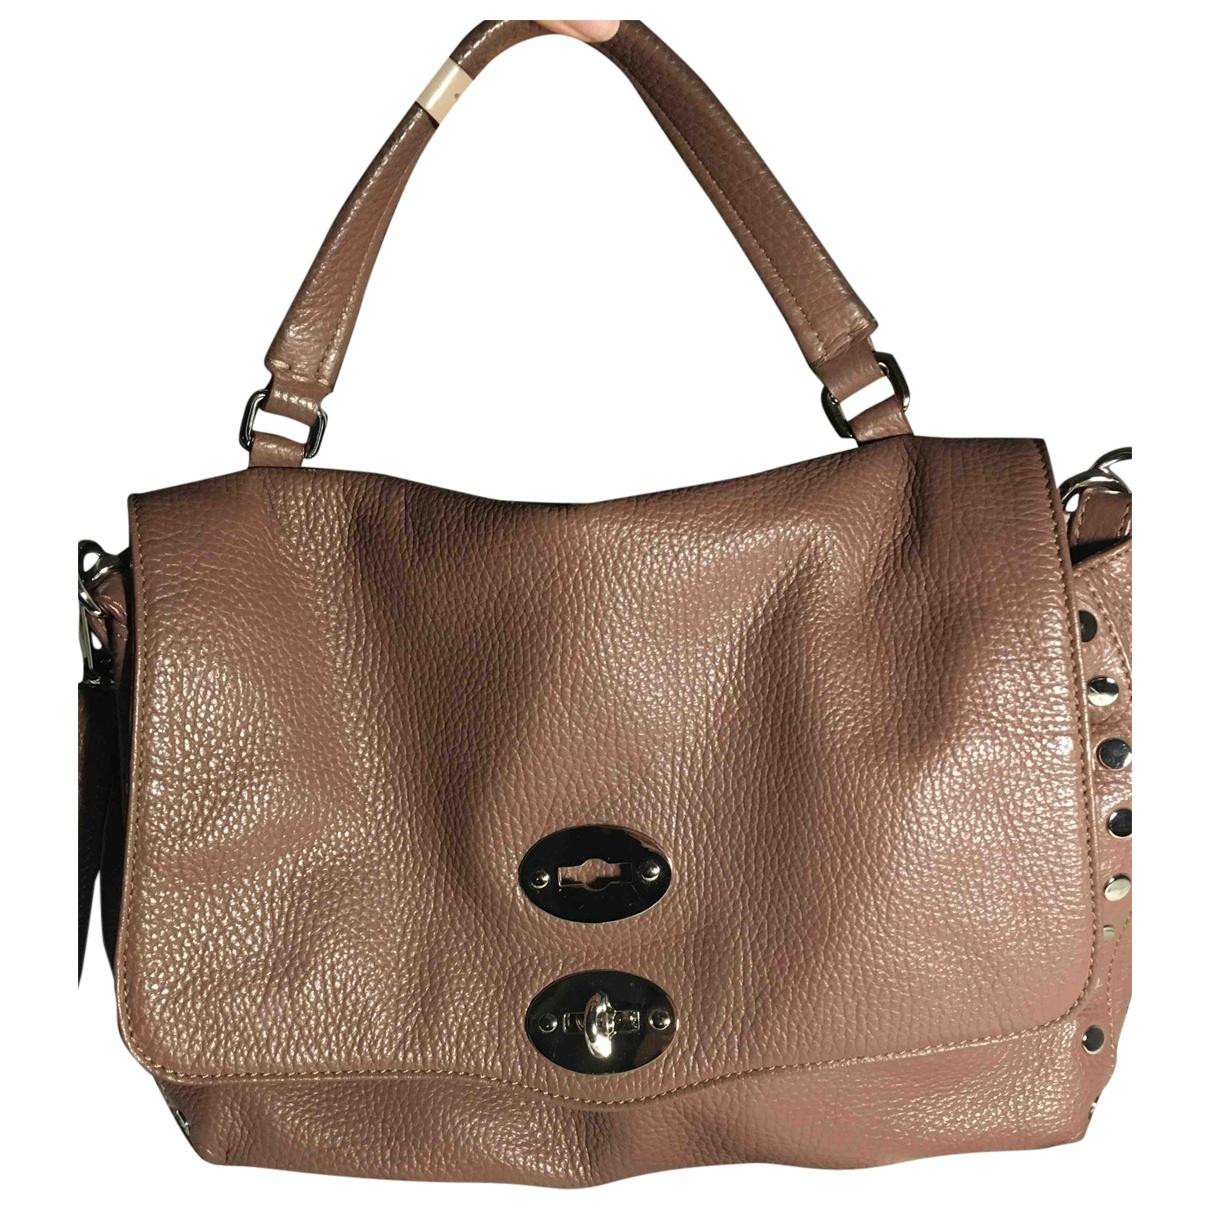 Zanellato \N Leather handbag for Women \N